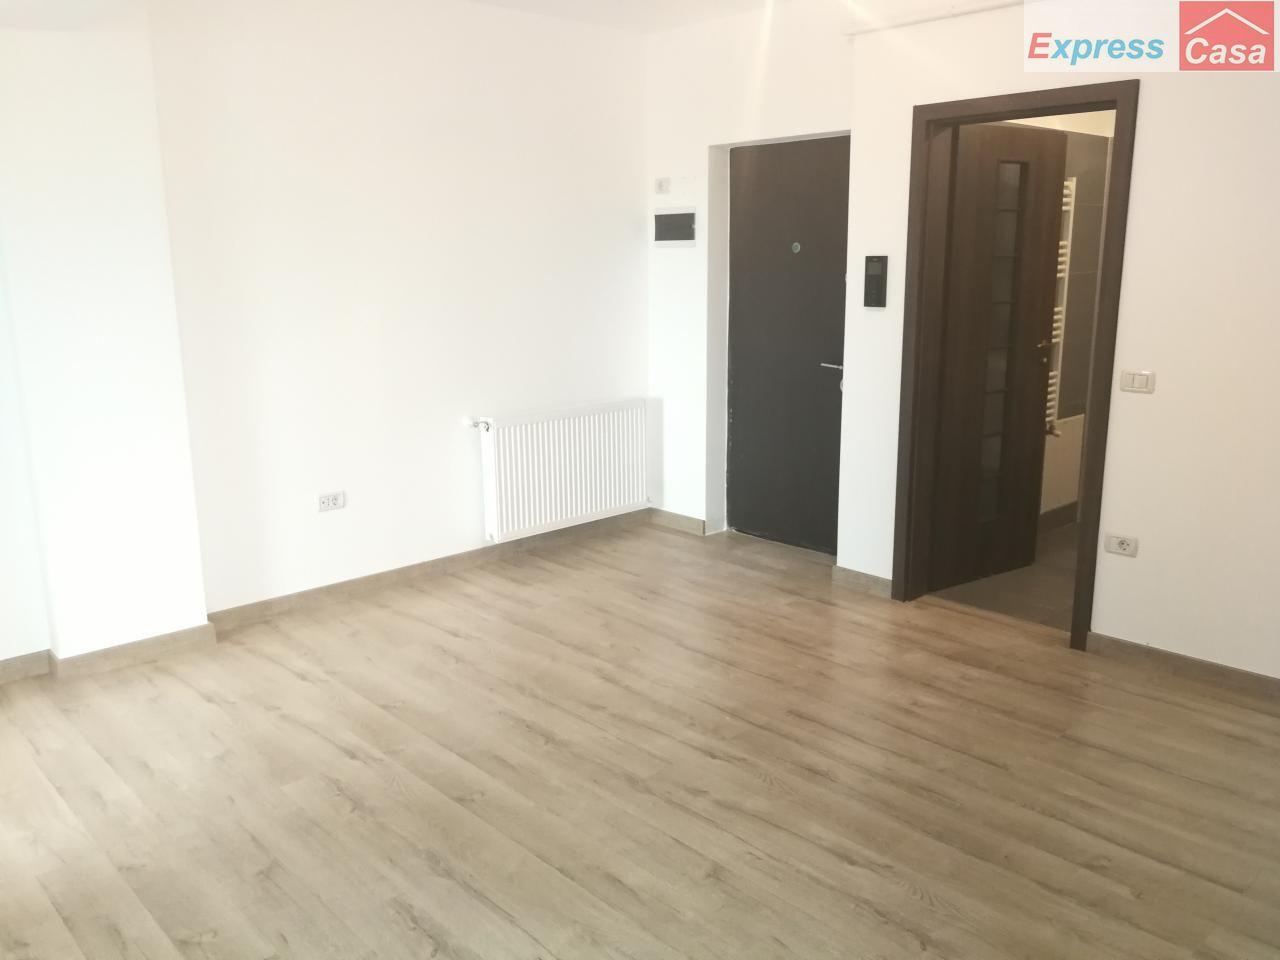 Apartament de vanzare, Iași (judet), Nicolina 1 - Foto 6